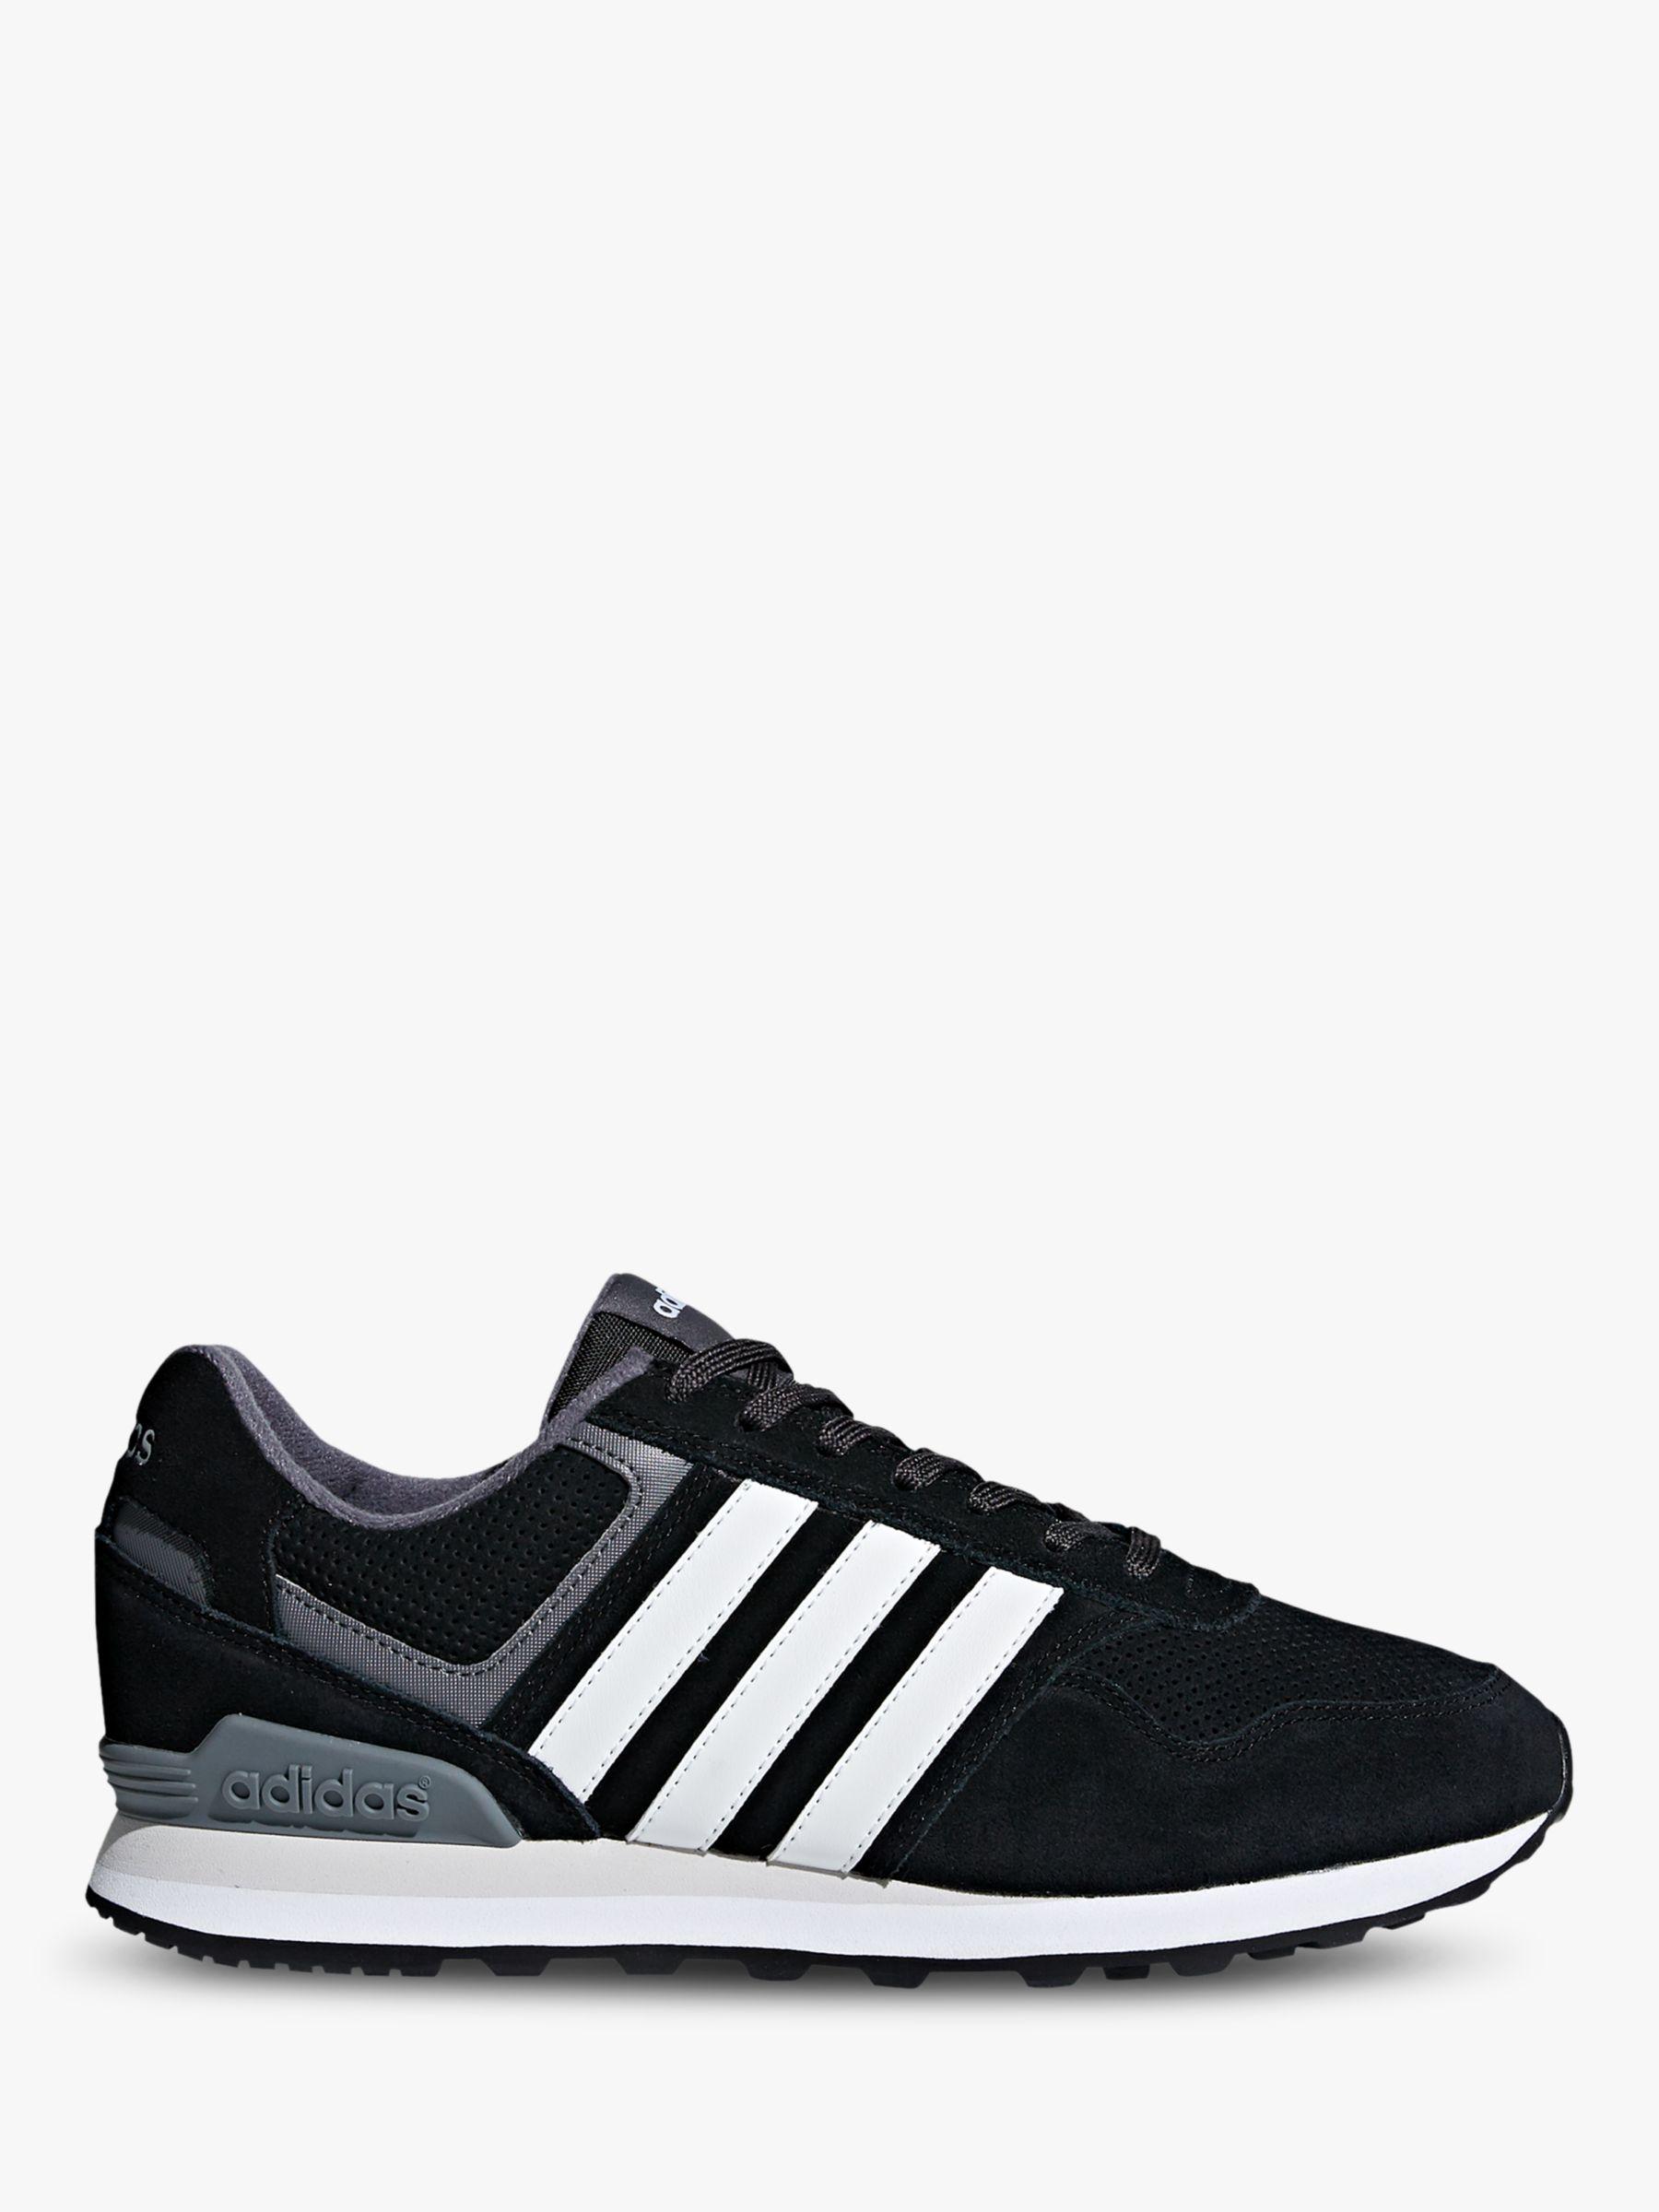 adidas 10k Men's Trainers, Core Black